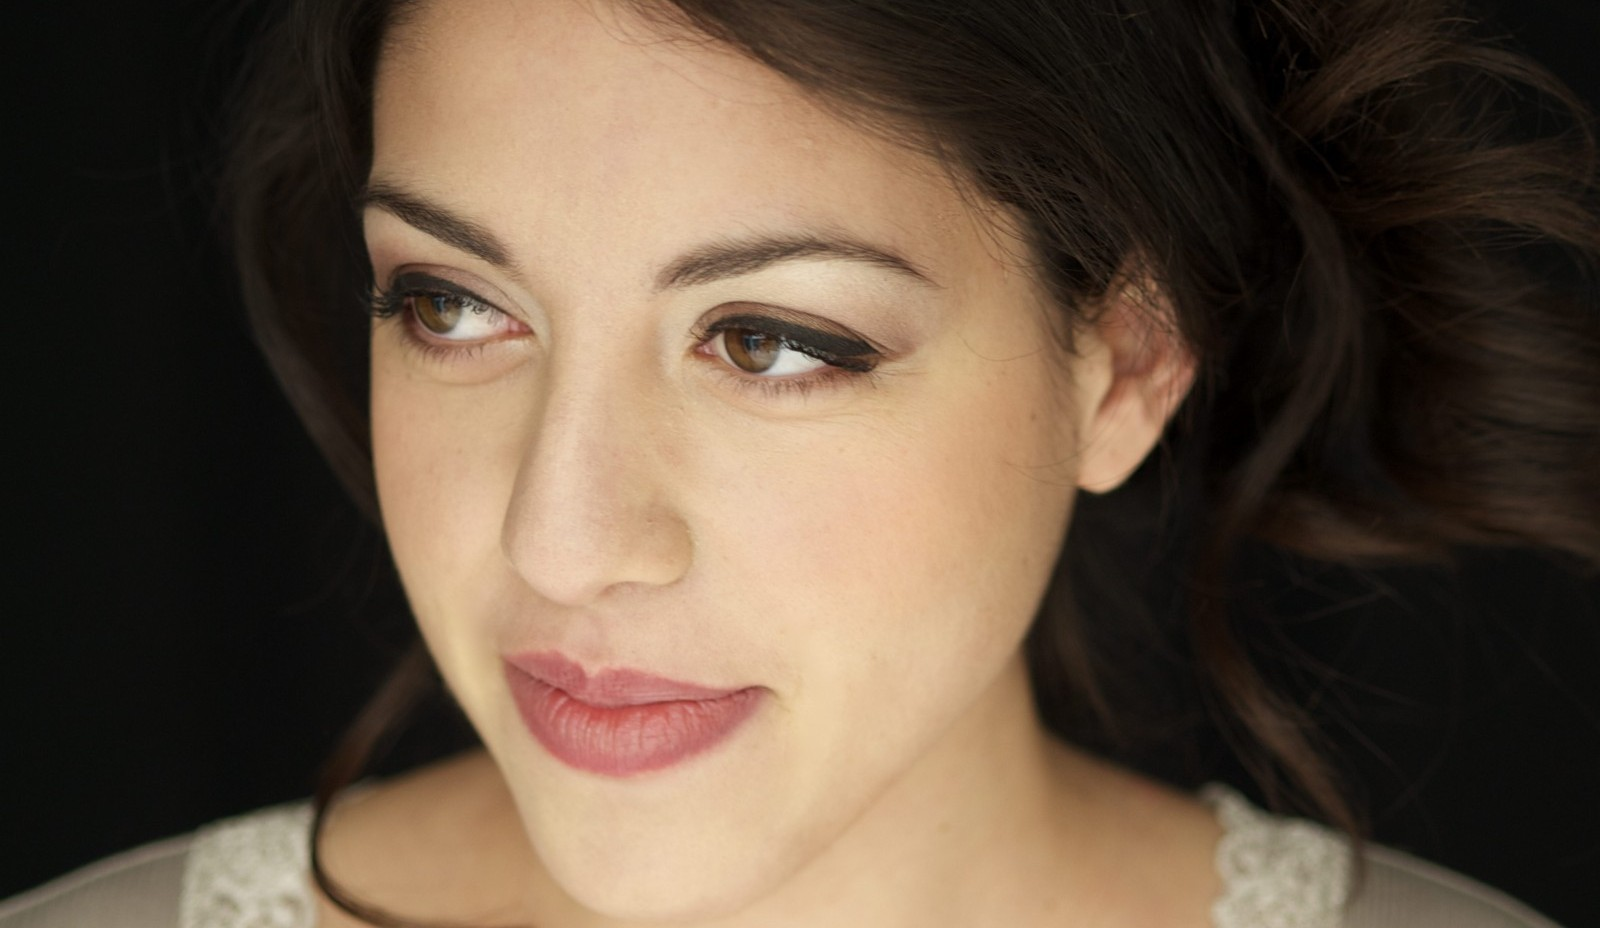 Pianist Beatrice Rana will play a daring program with the Buffalo Philharmonic Orchestra.